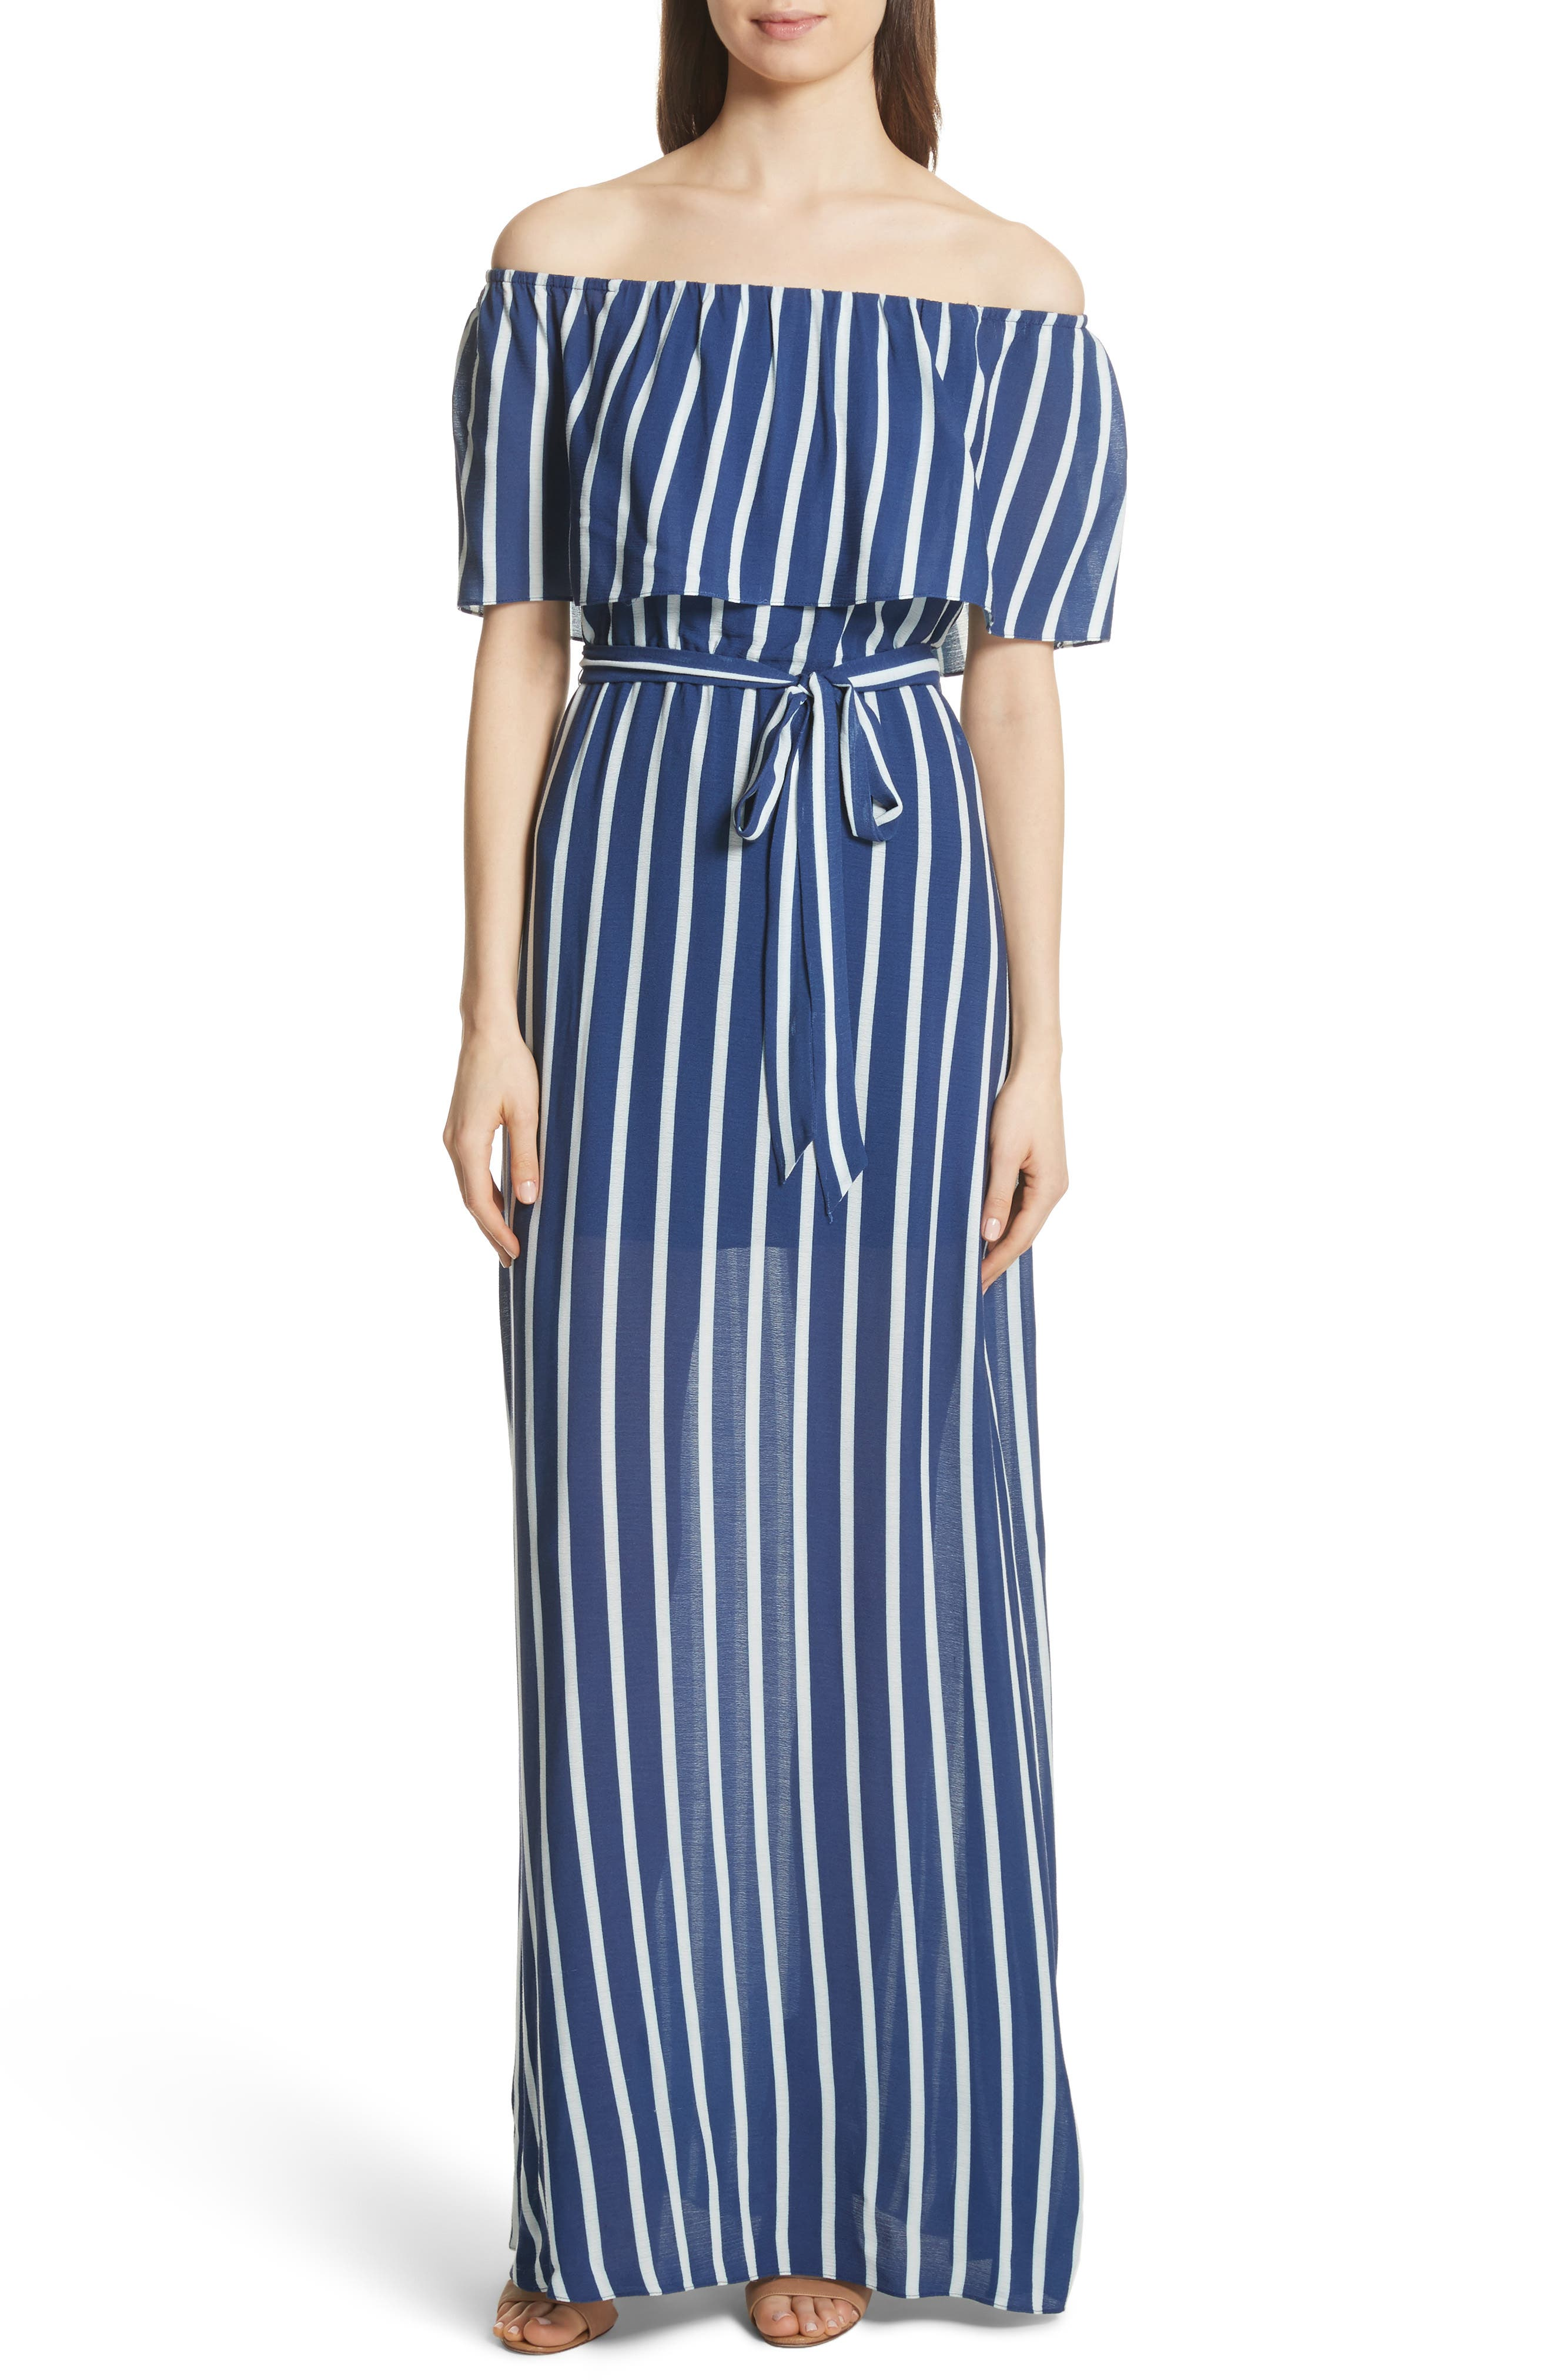 Grazi Off the Shoulder Maxi Dress,                             Main thumbnail 1, color,                             Oasis Stripe